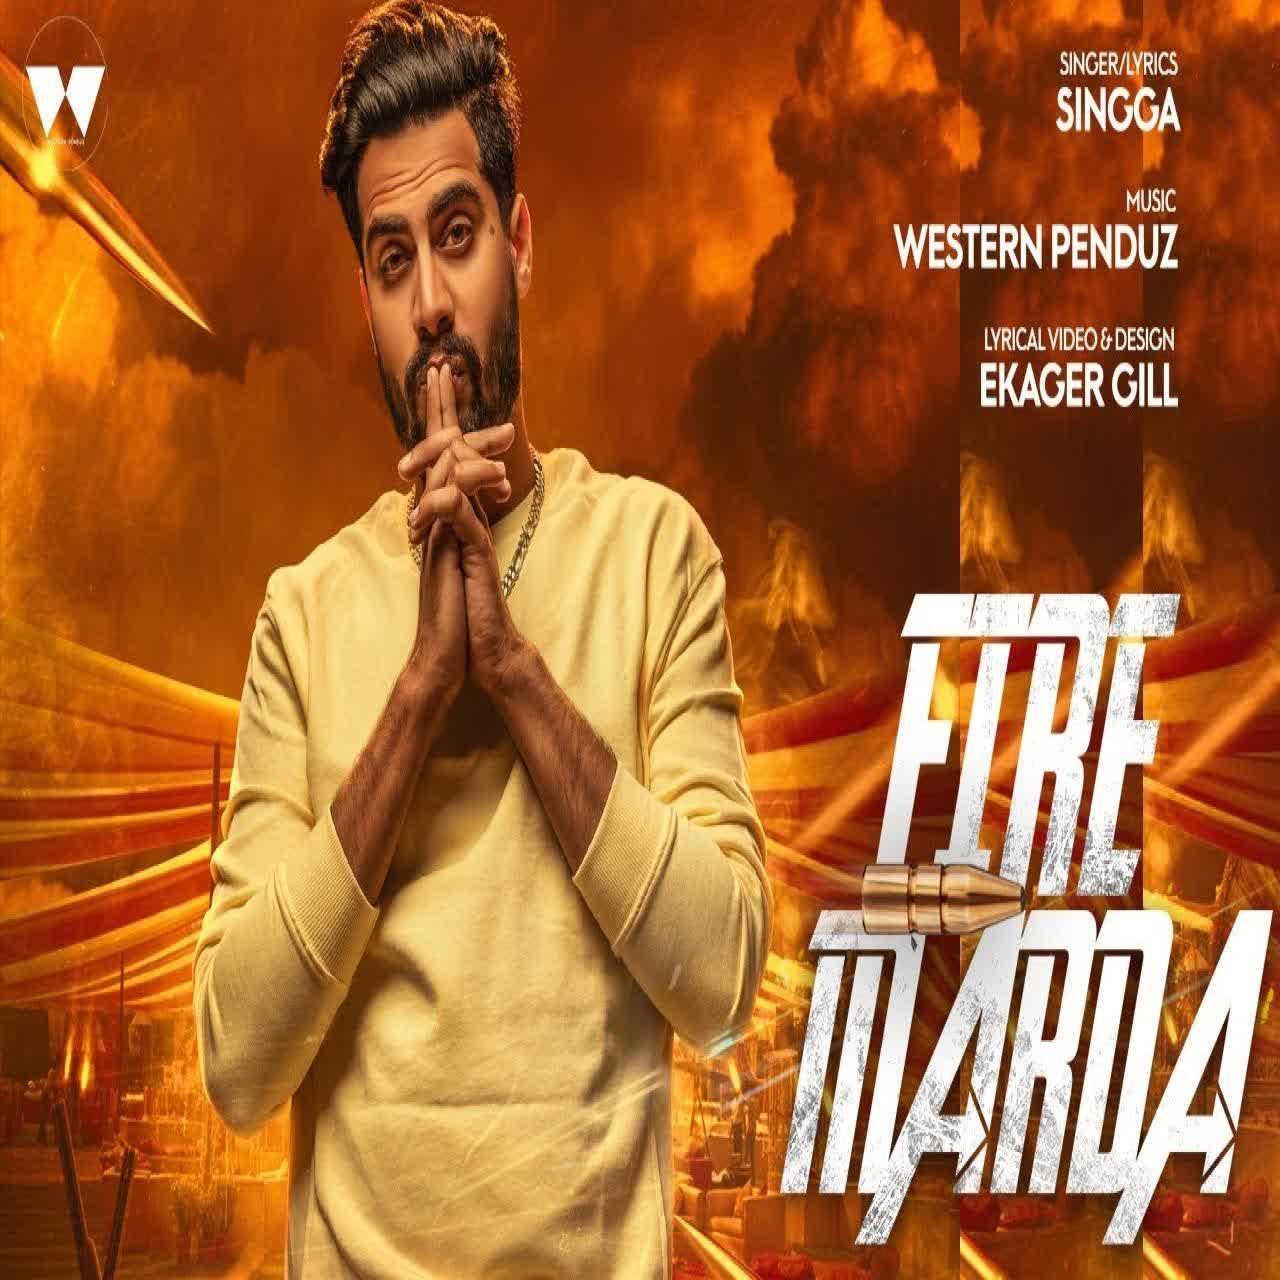 Fire Marda 2 Singga